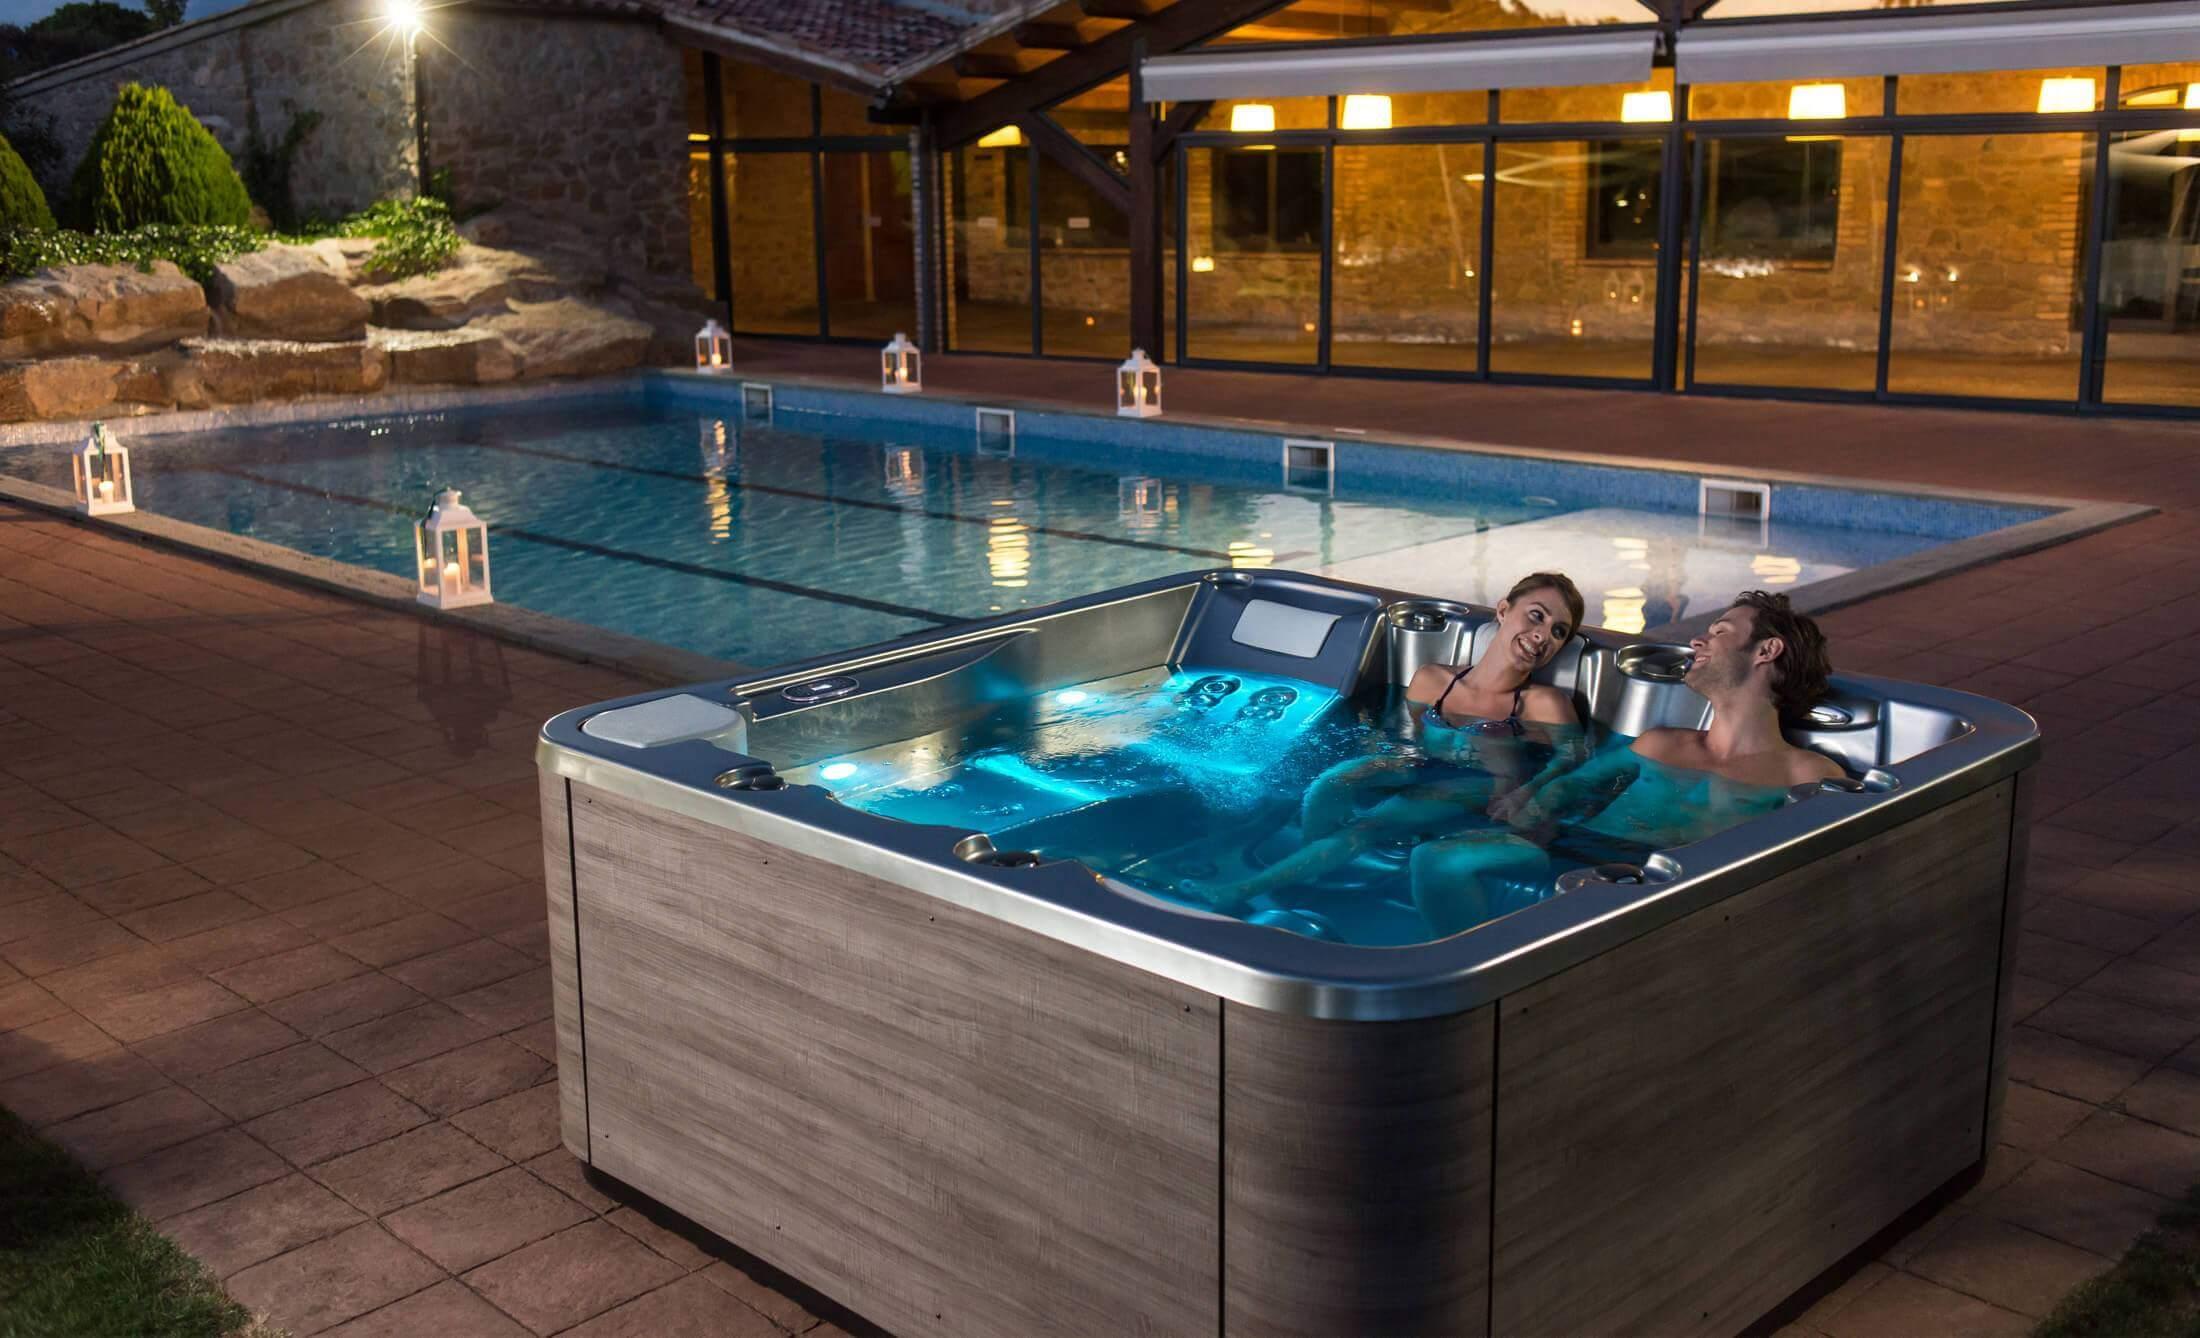 Ou Acheter Son Spa fabricant de spa, jacuzzi et des spa de nage - aquavia spa